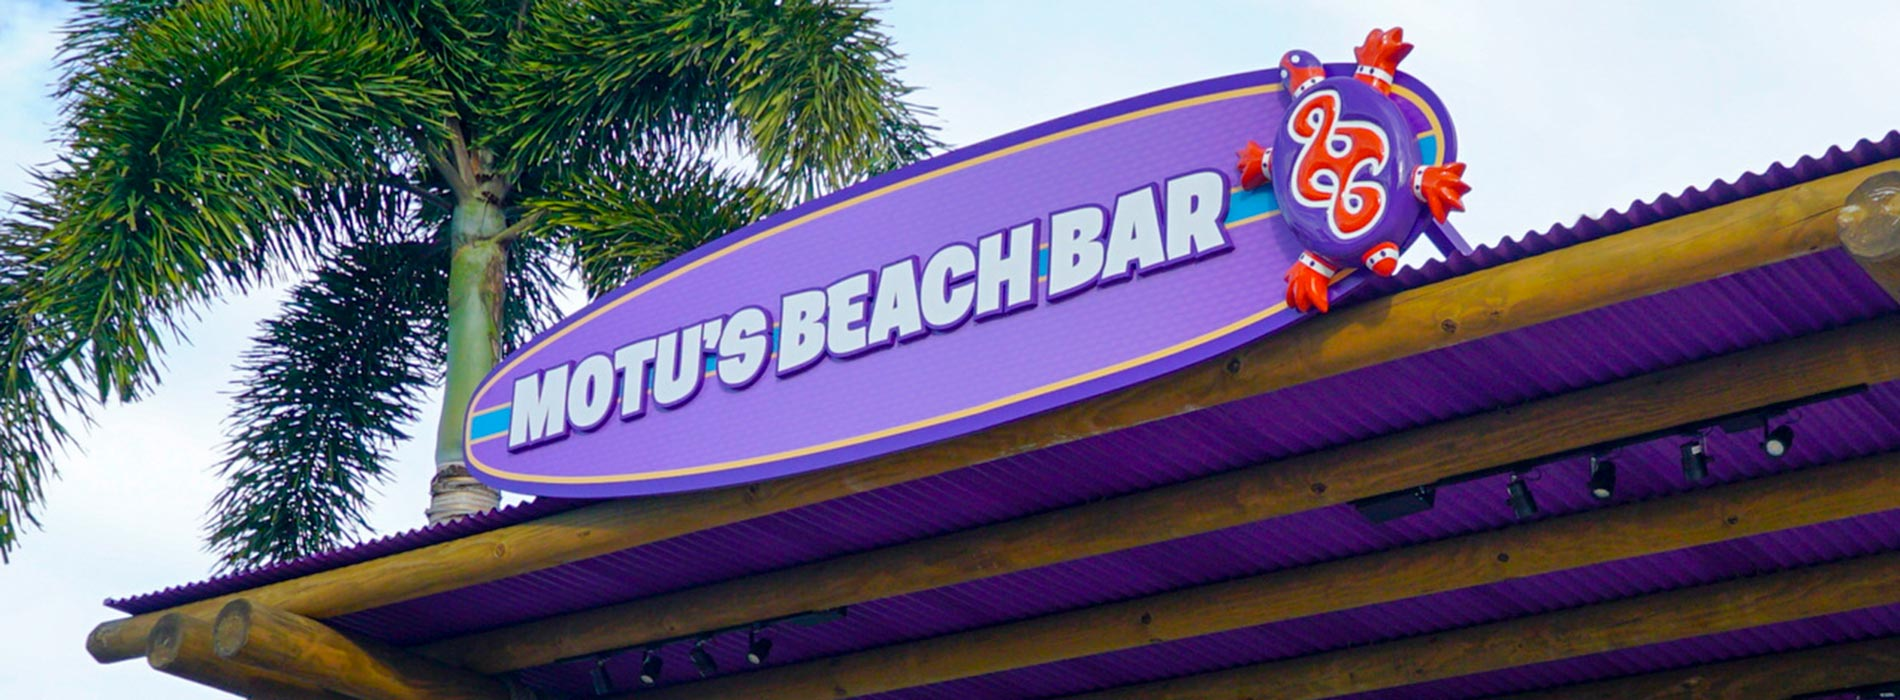 Motus Beach Bar at Aquatica Orlando